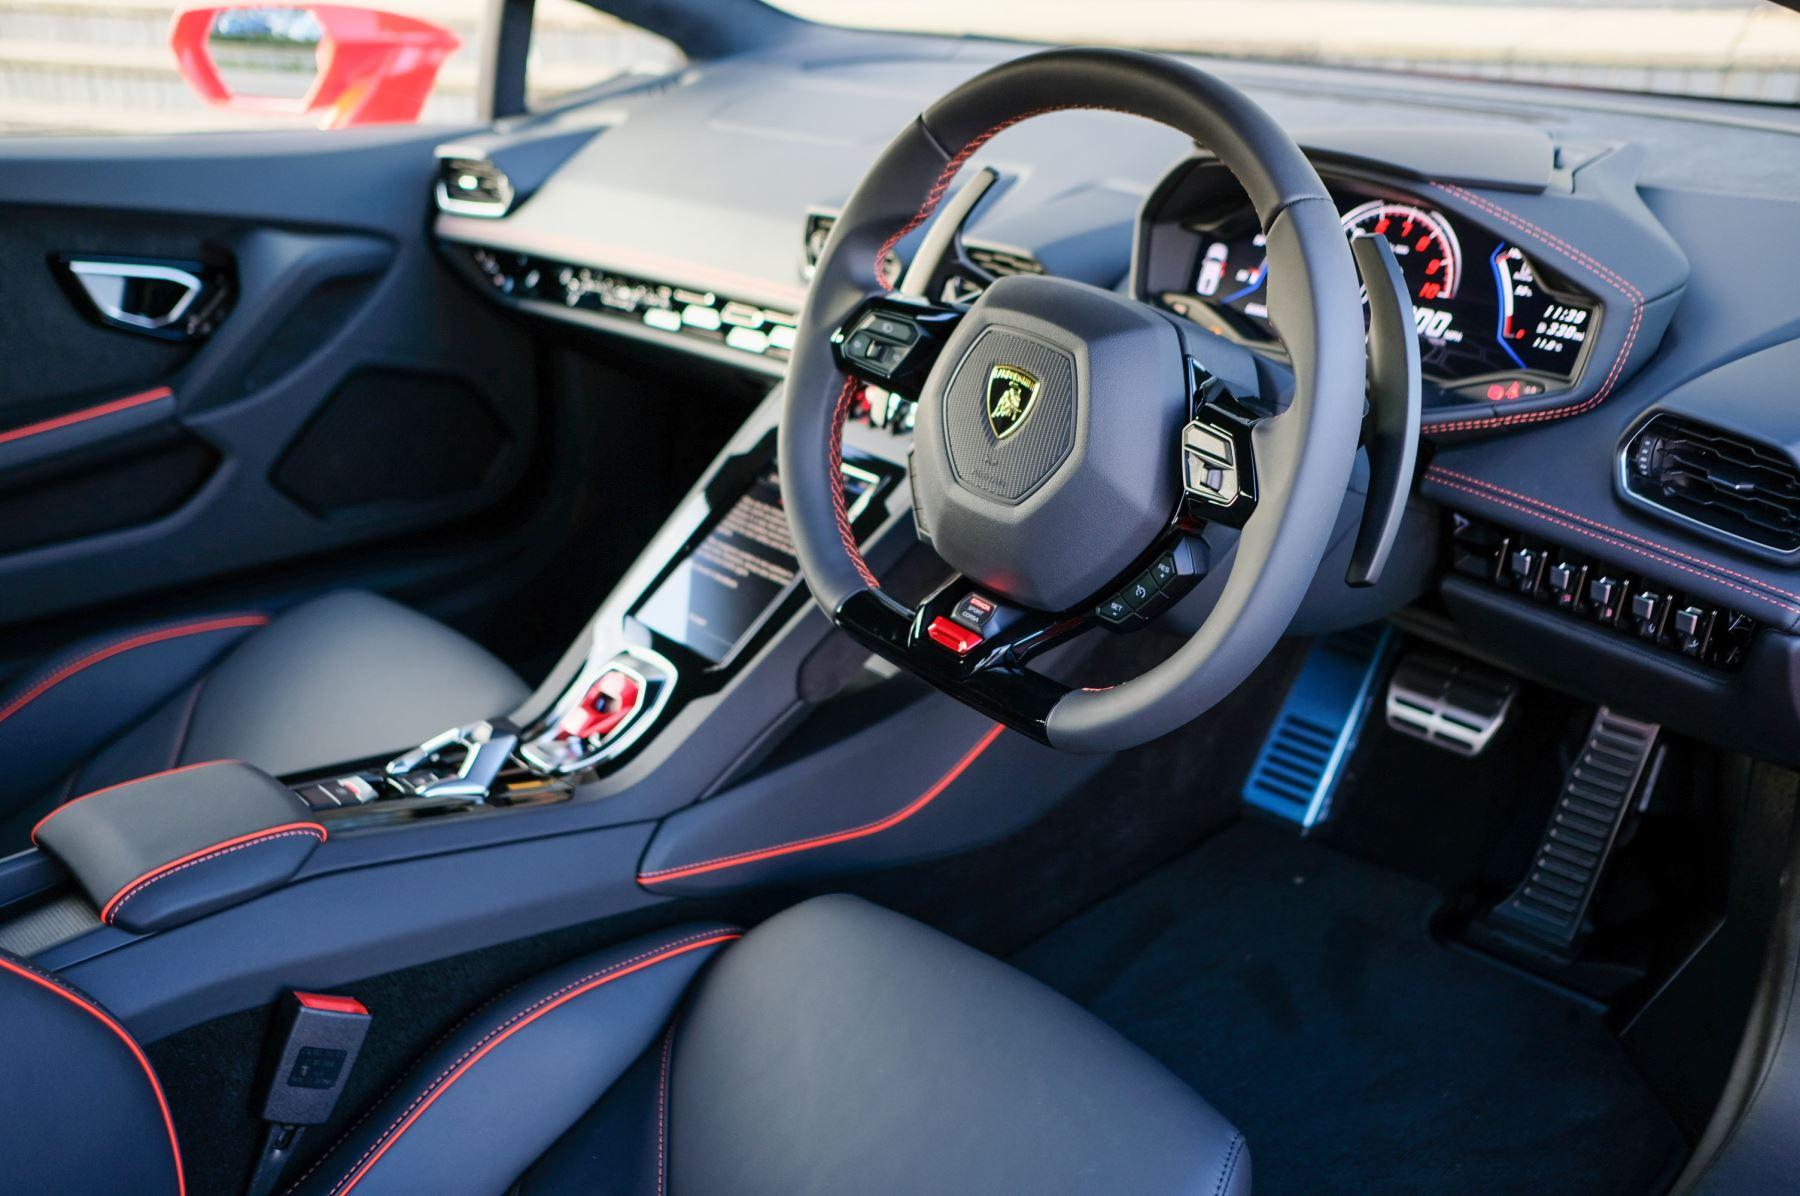 Lamborghini Huracan EVO 5.2 V10 640 2dr Auto AWD image 17